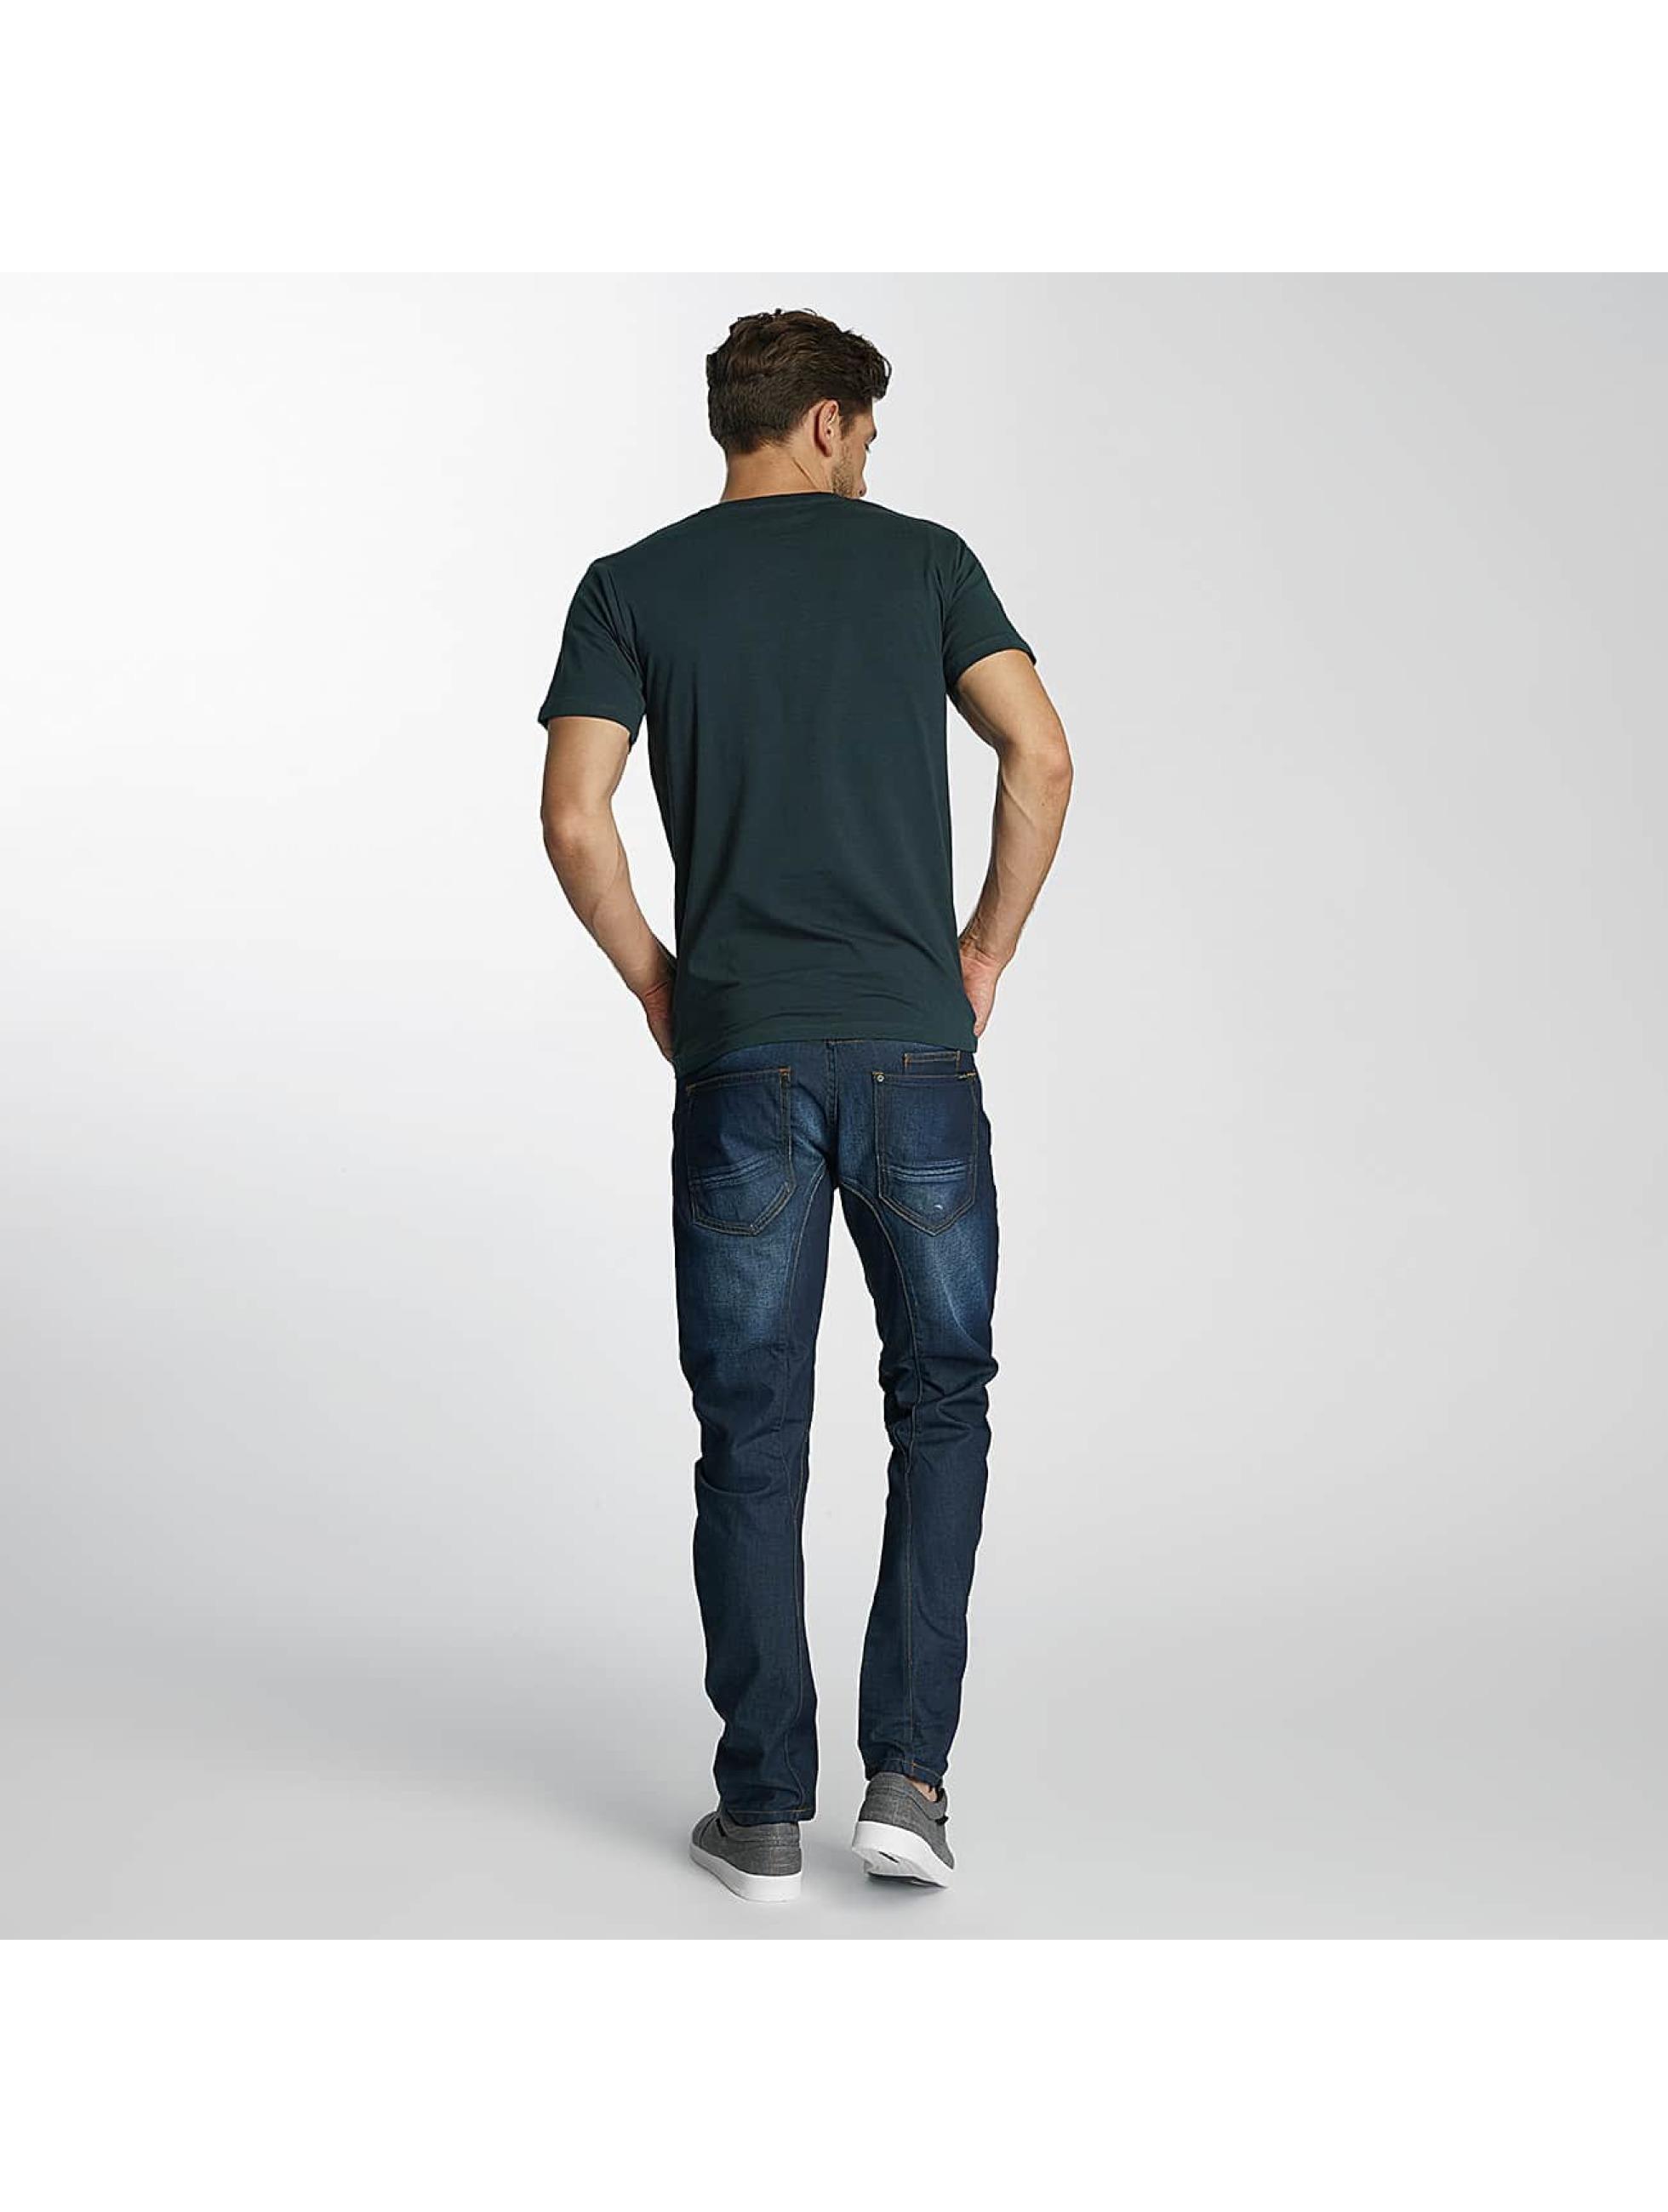 Paris Premium T-Shirt Basic vert